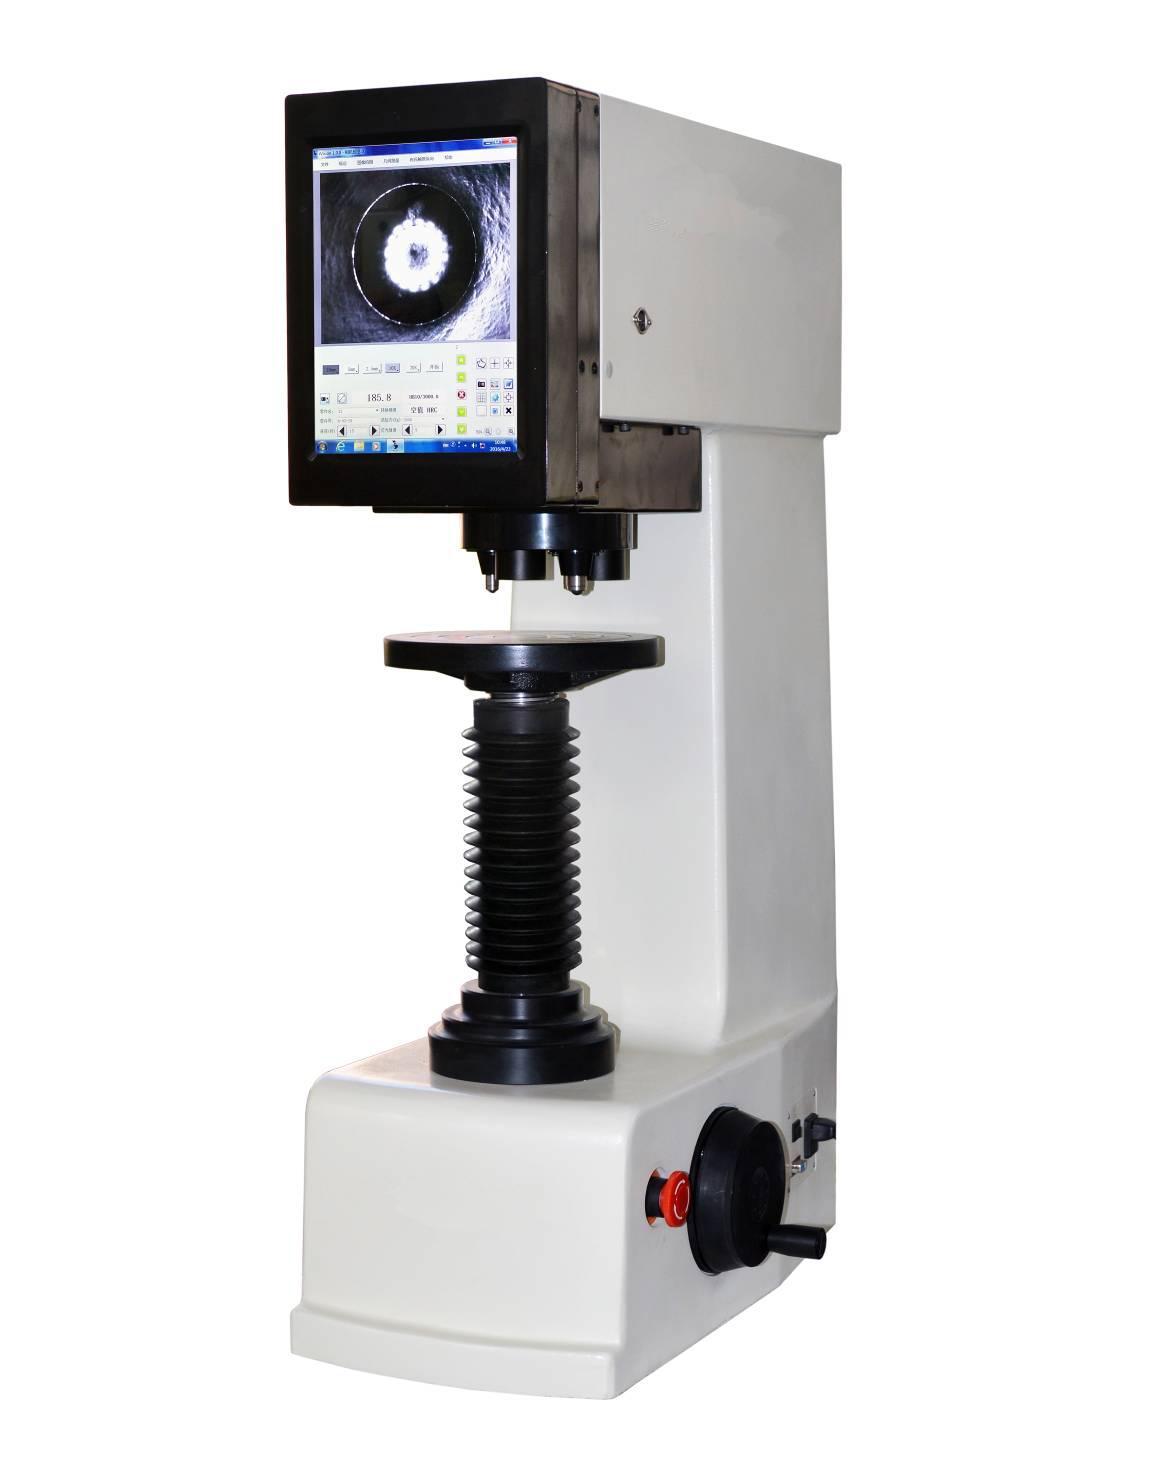 XHBT-3000ZIII全自动三压头数显布氏硬度计